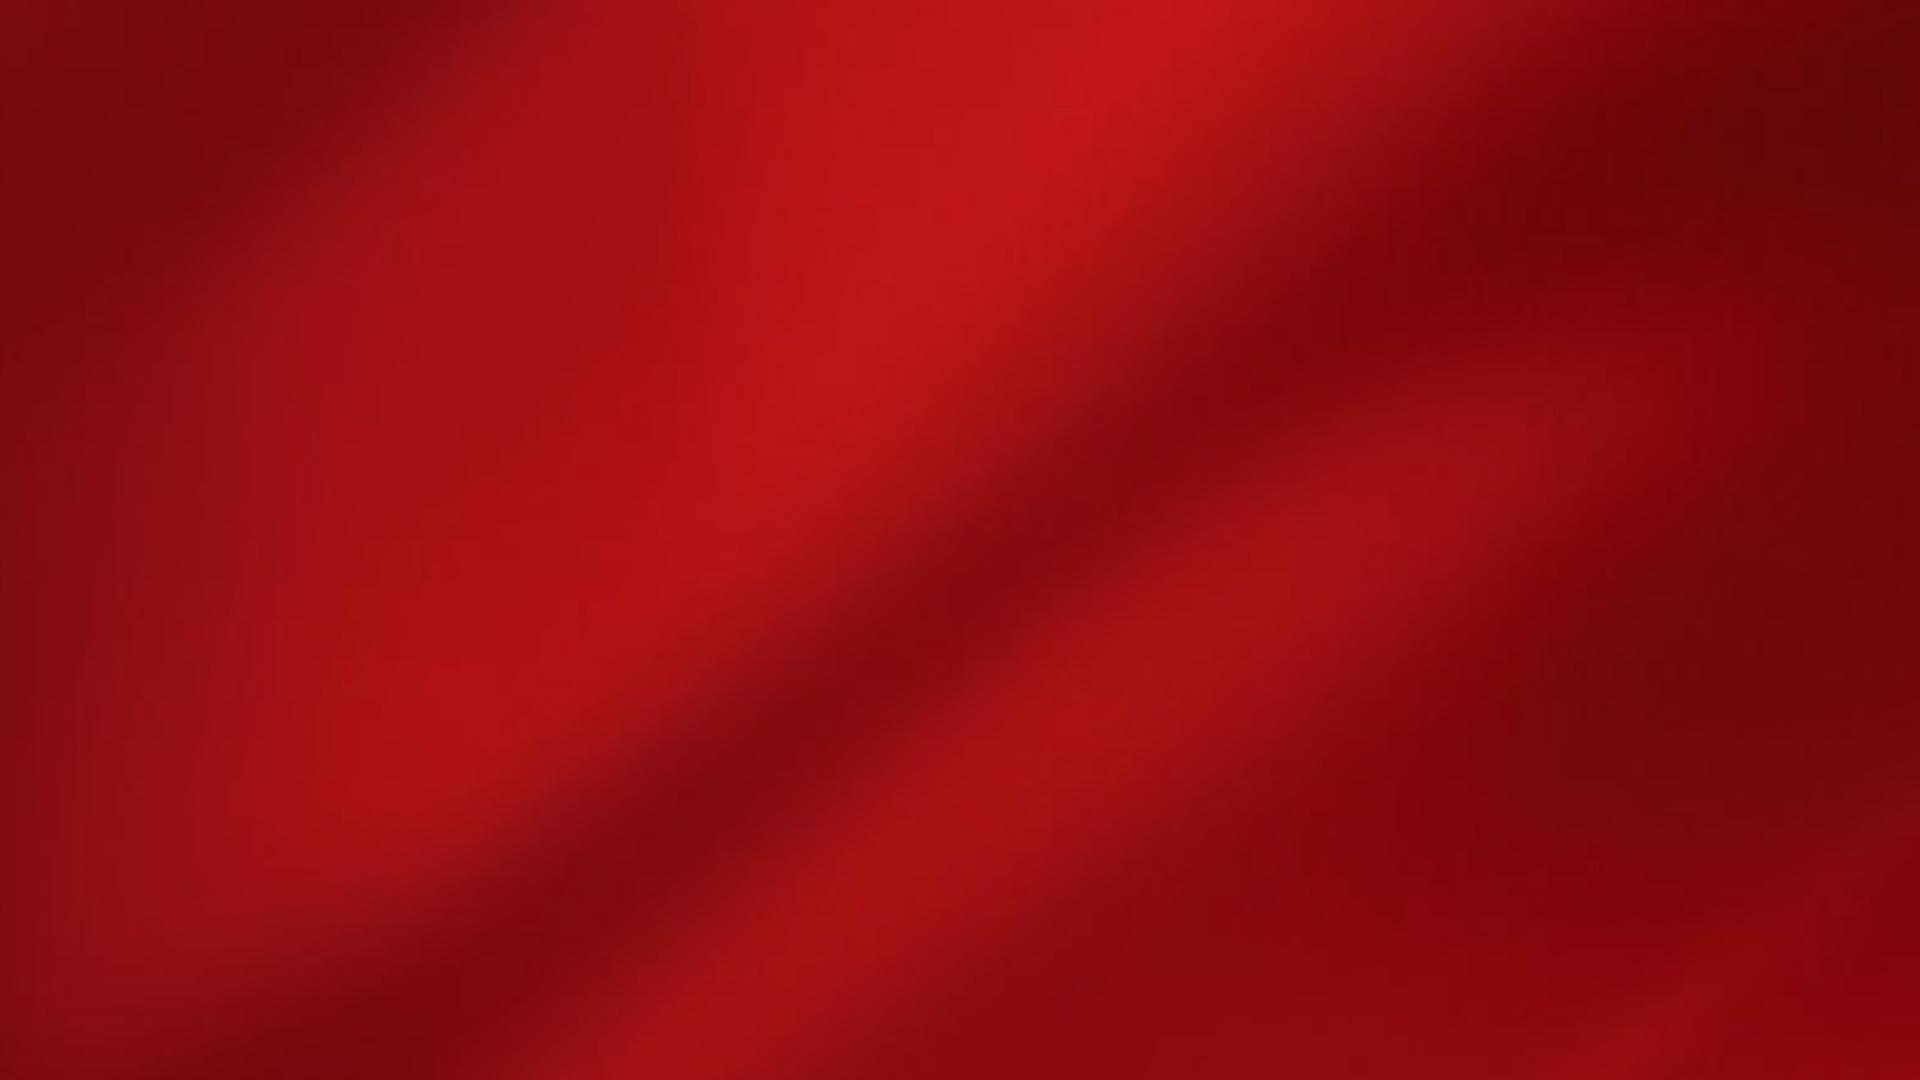 BANDě邦地美 七彩墙衣之红色赤心,祝祖国红红火火!